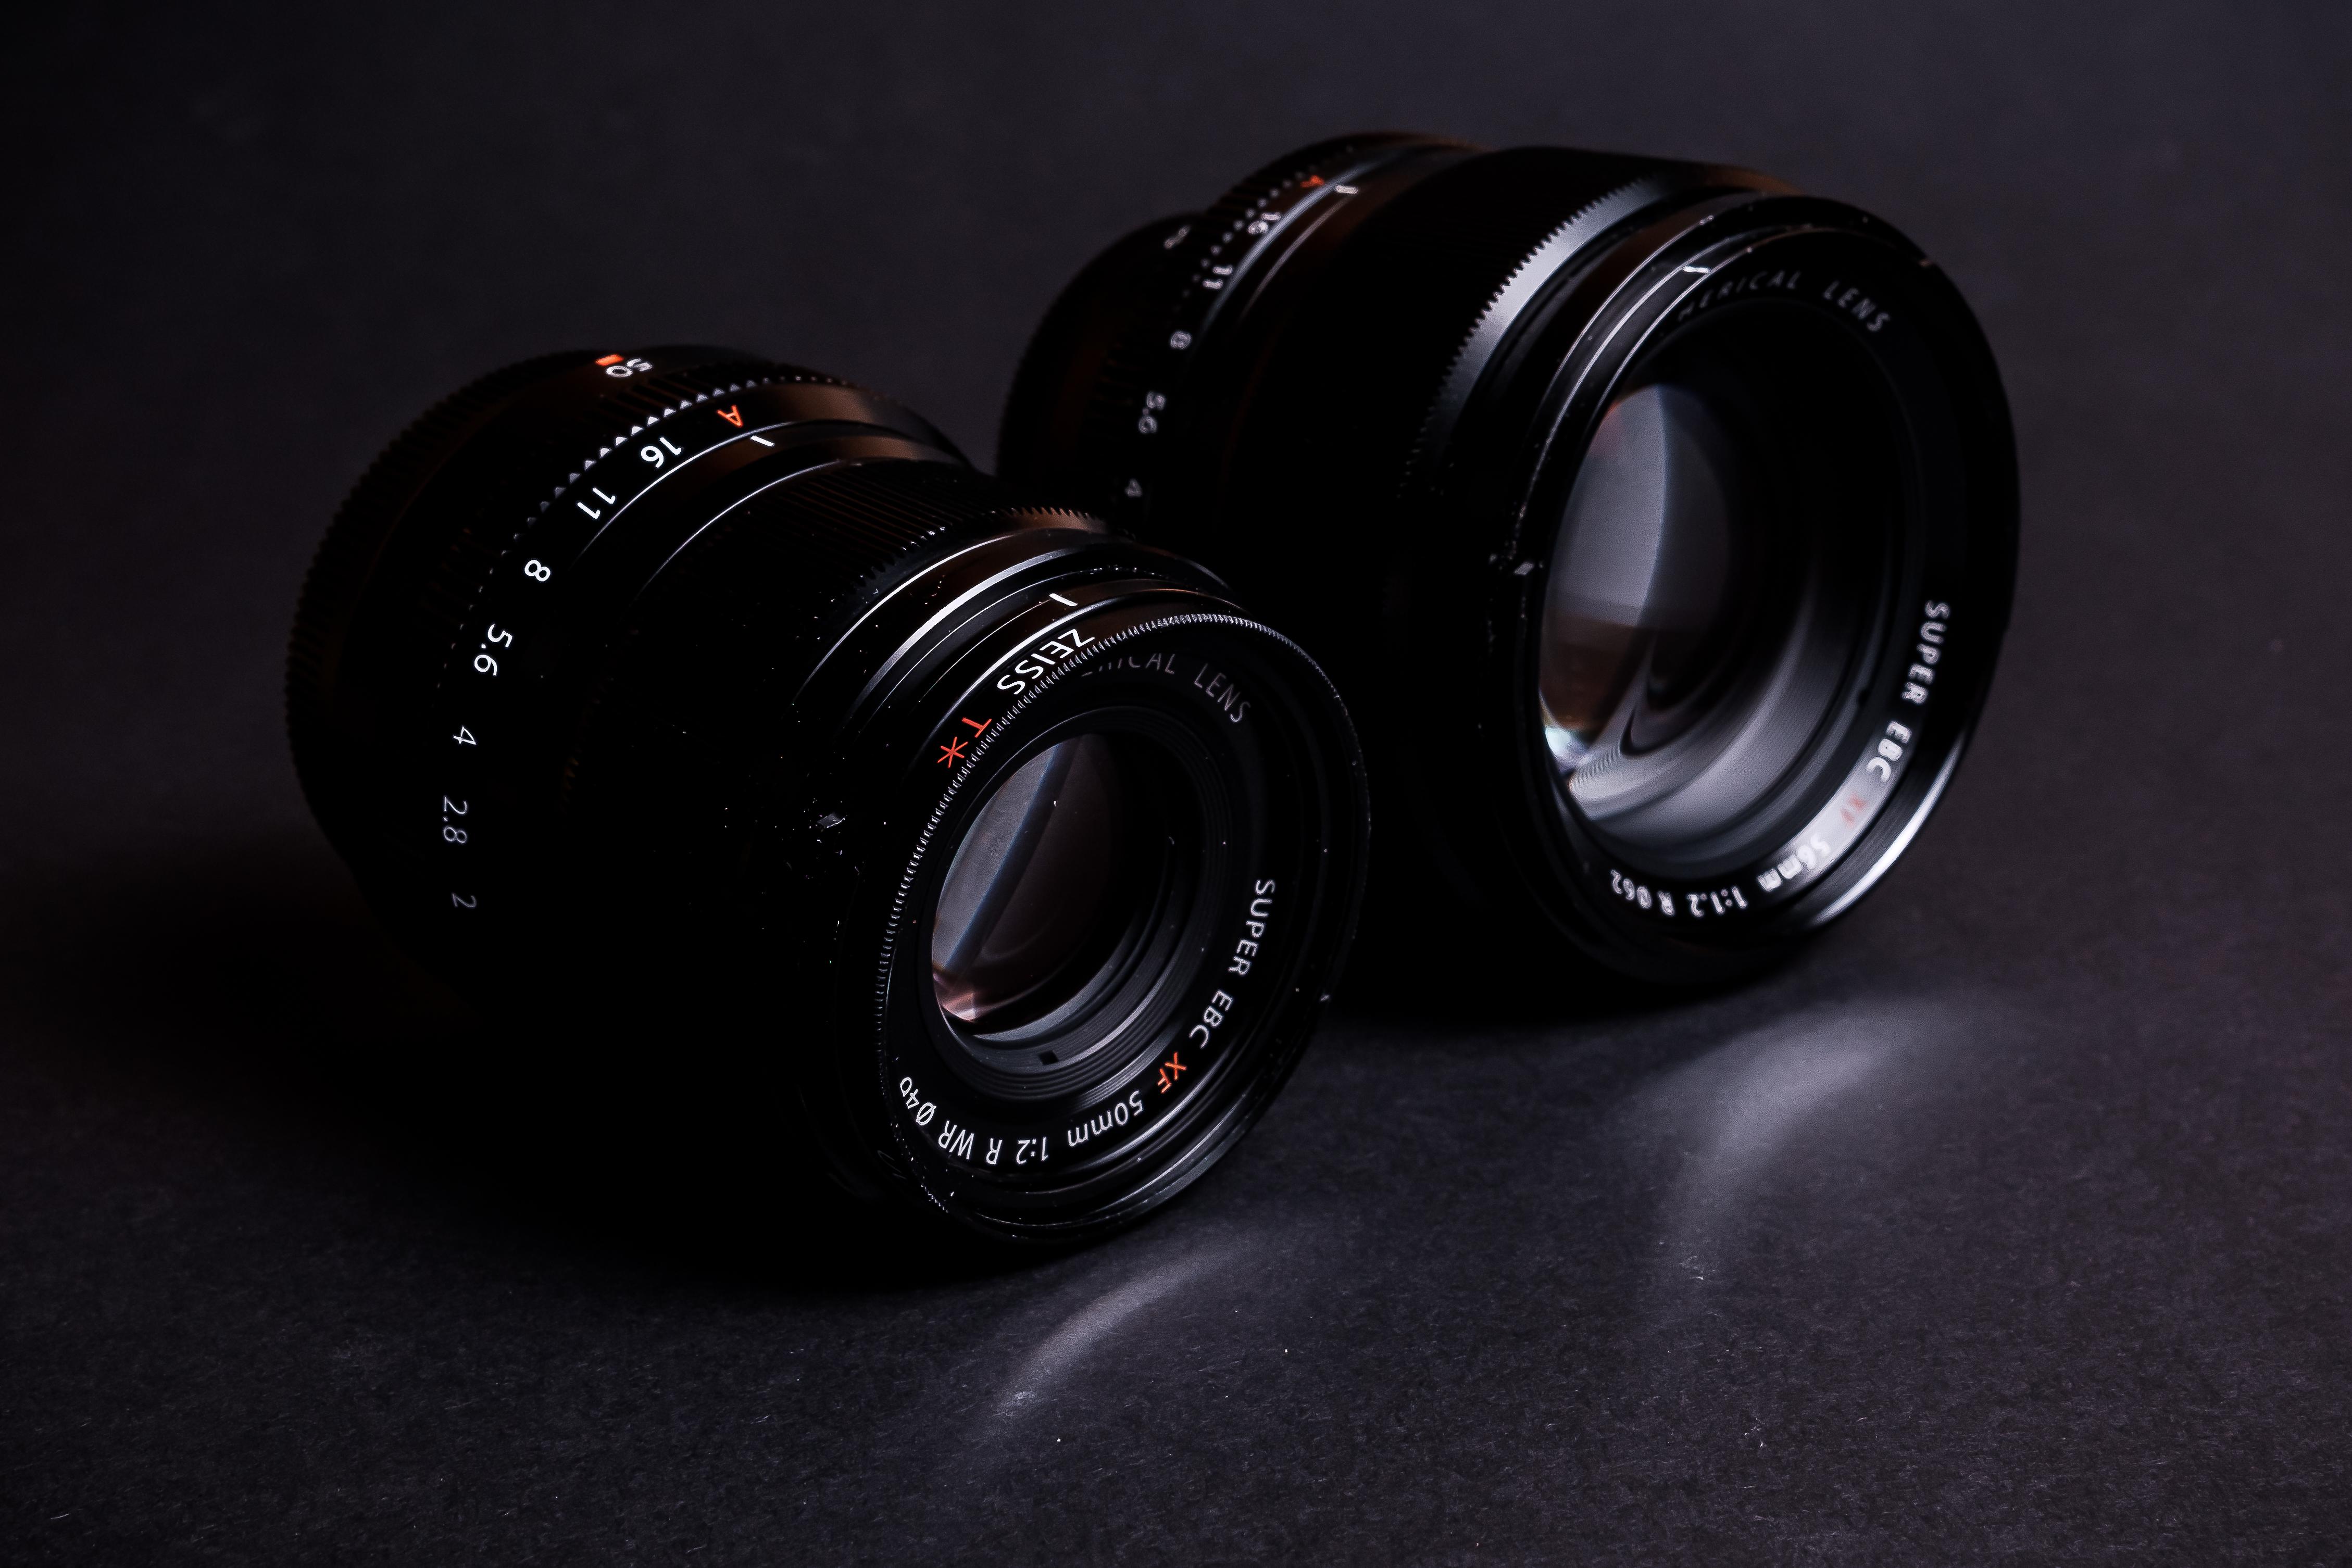 Fujifilm XF50mmF2 V Fujifilm XF56mmF1.2